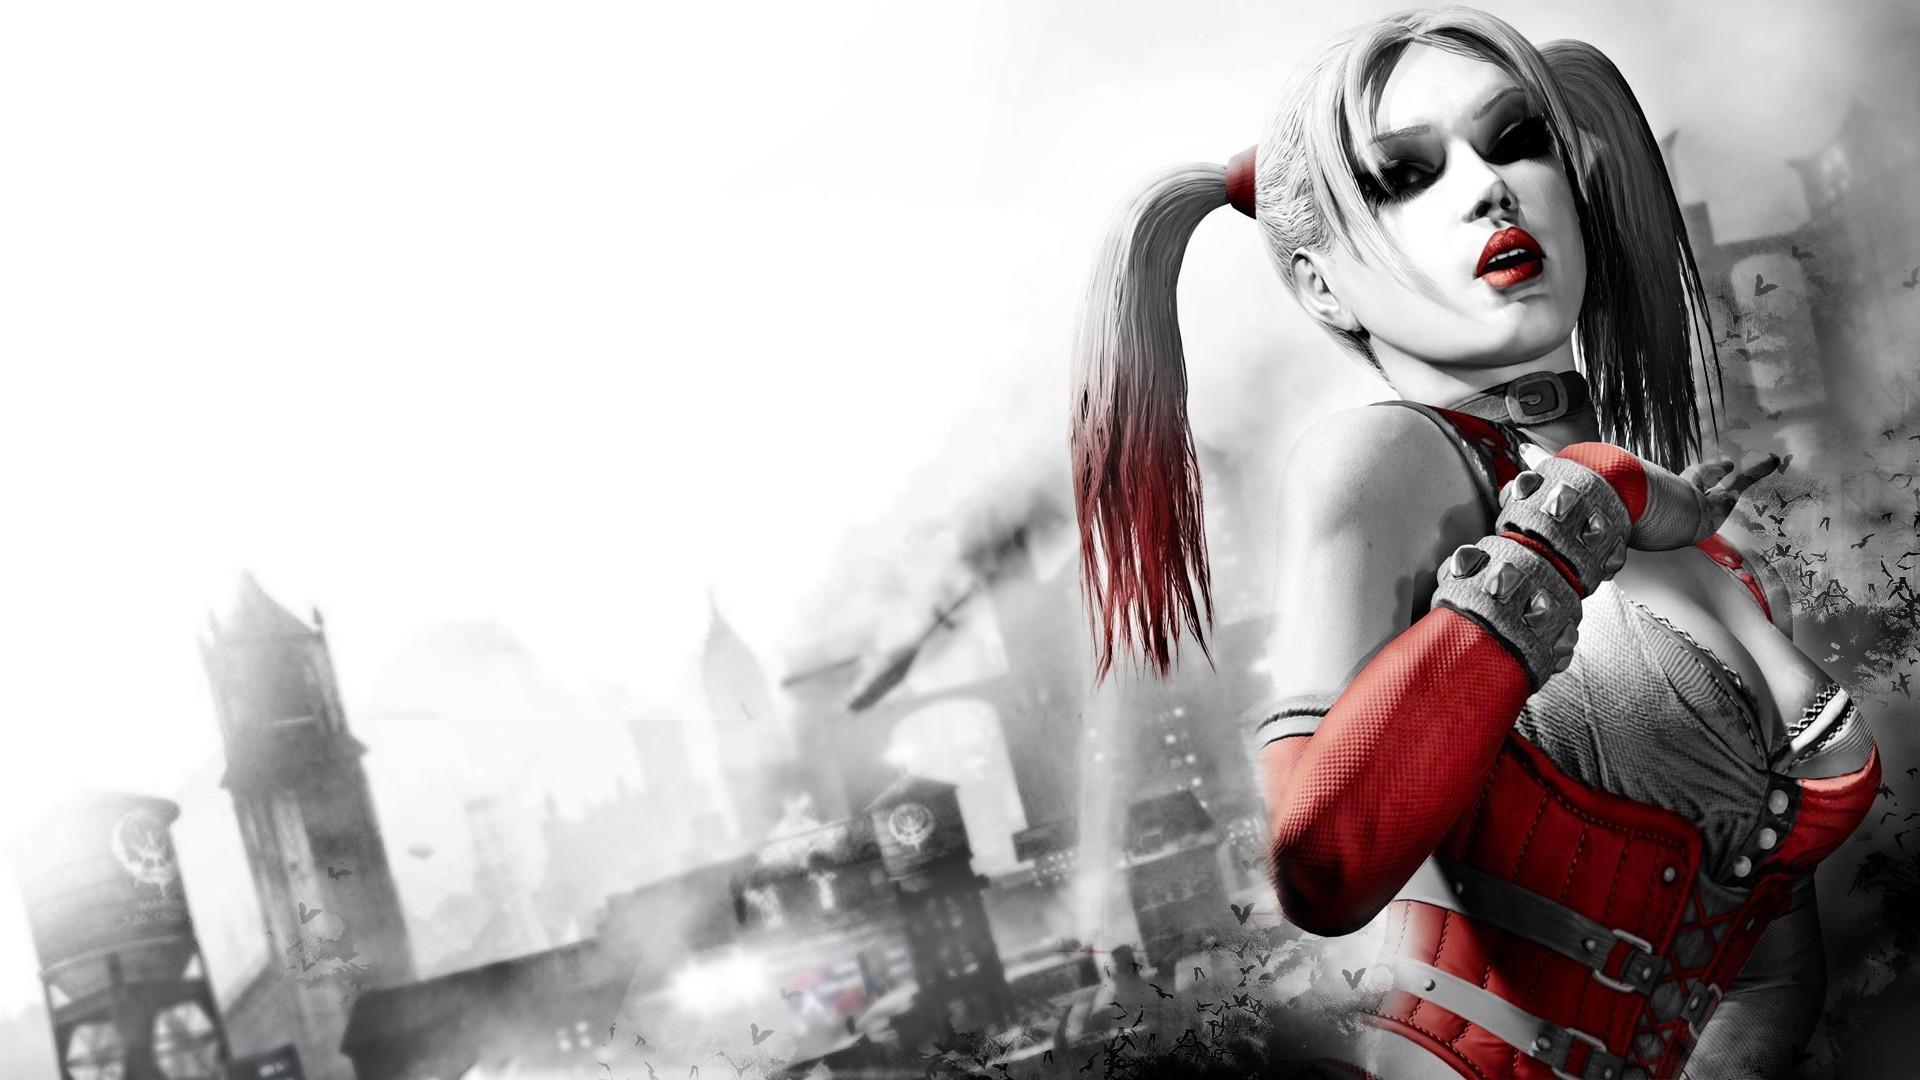 1920x1080 Px Batman Arkham City Harley Quinn